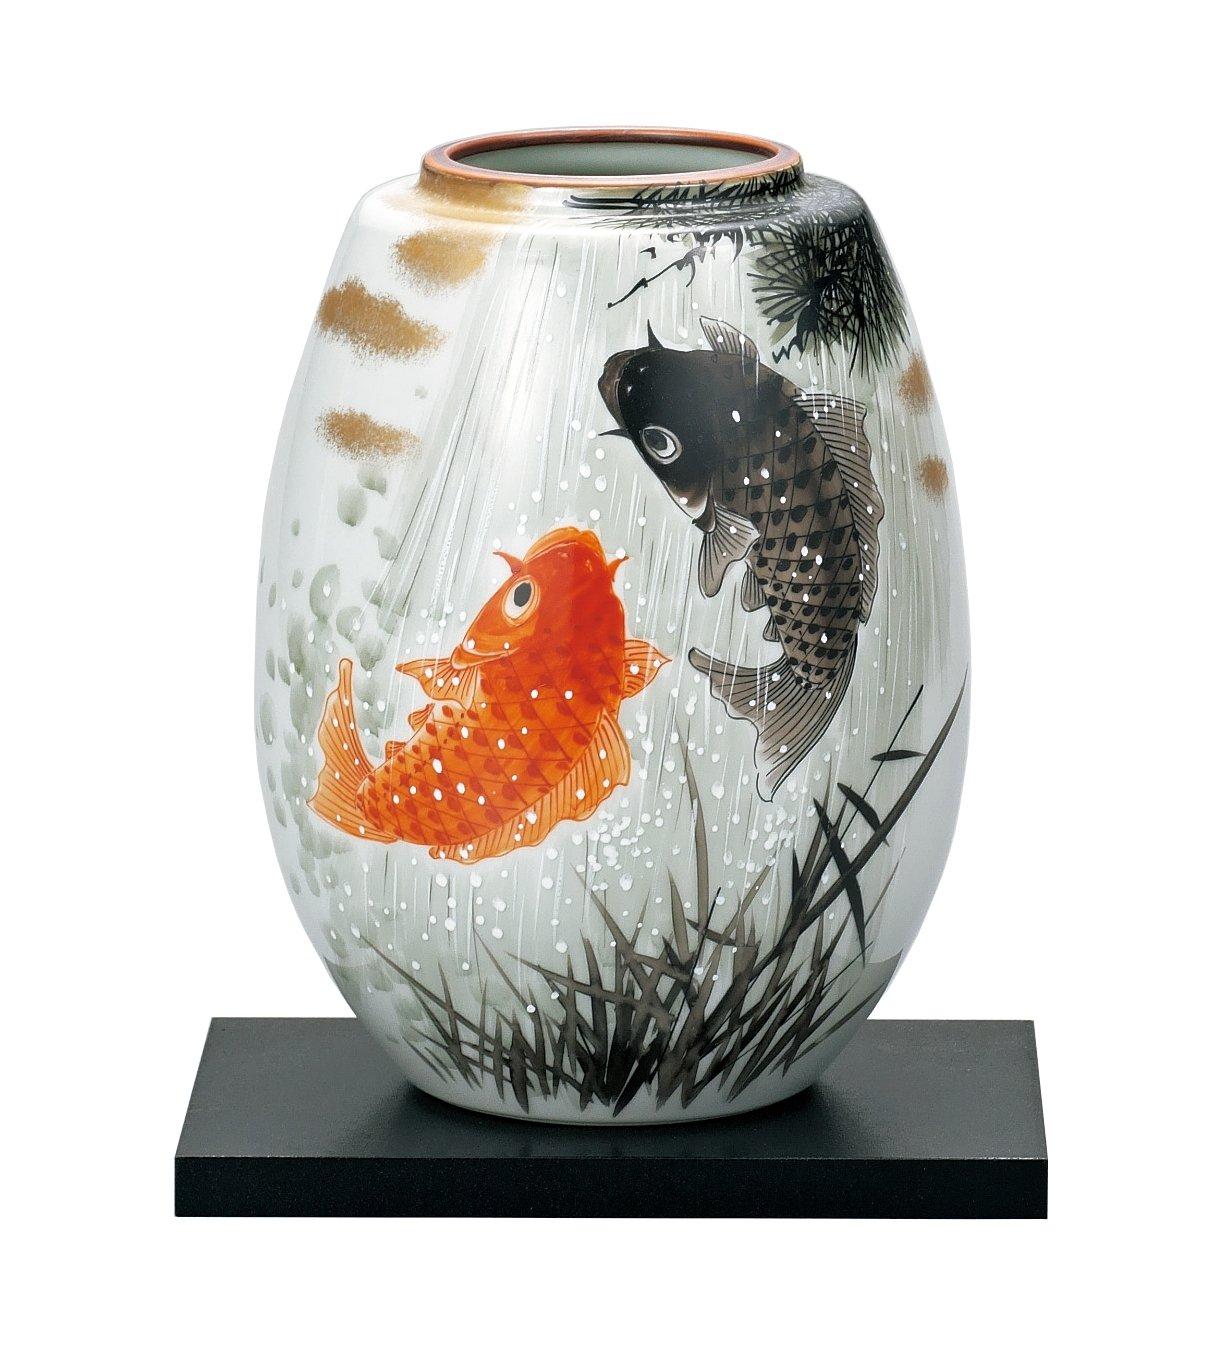 マルサン宮本 九谷焼 花器 8号花瓶 夫婦鯉滝登り AP3-1033 B01HXQMGLO